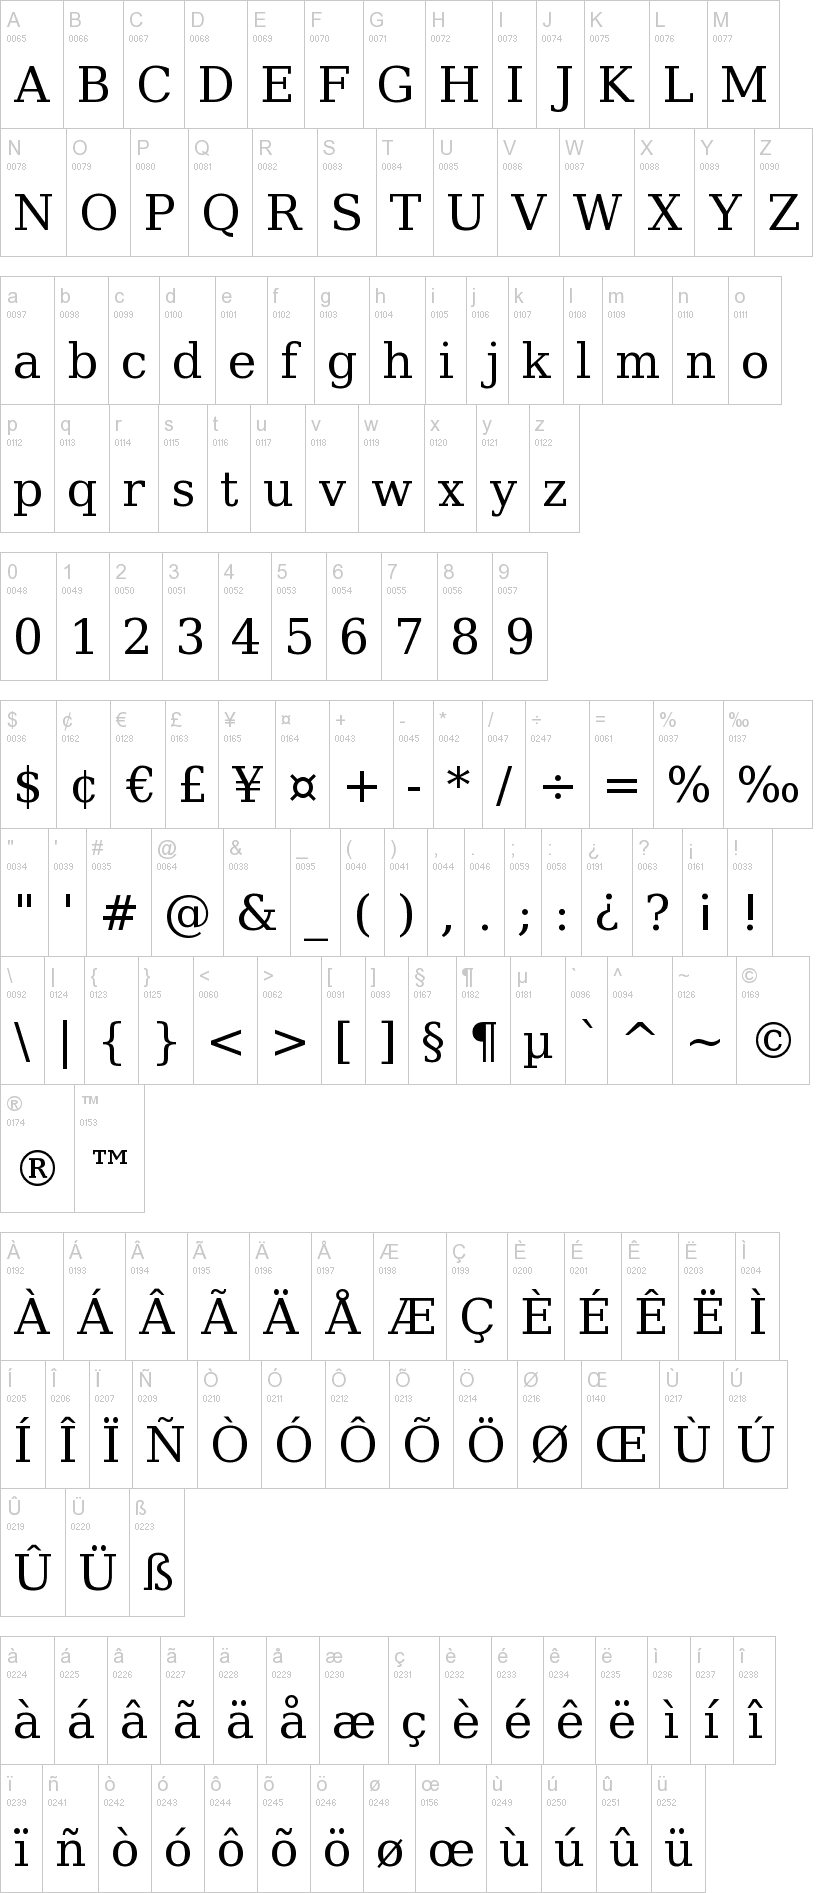 Bitstream Vera Serif Font | dafont com